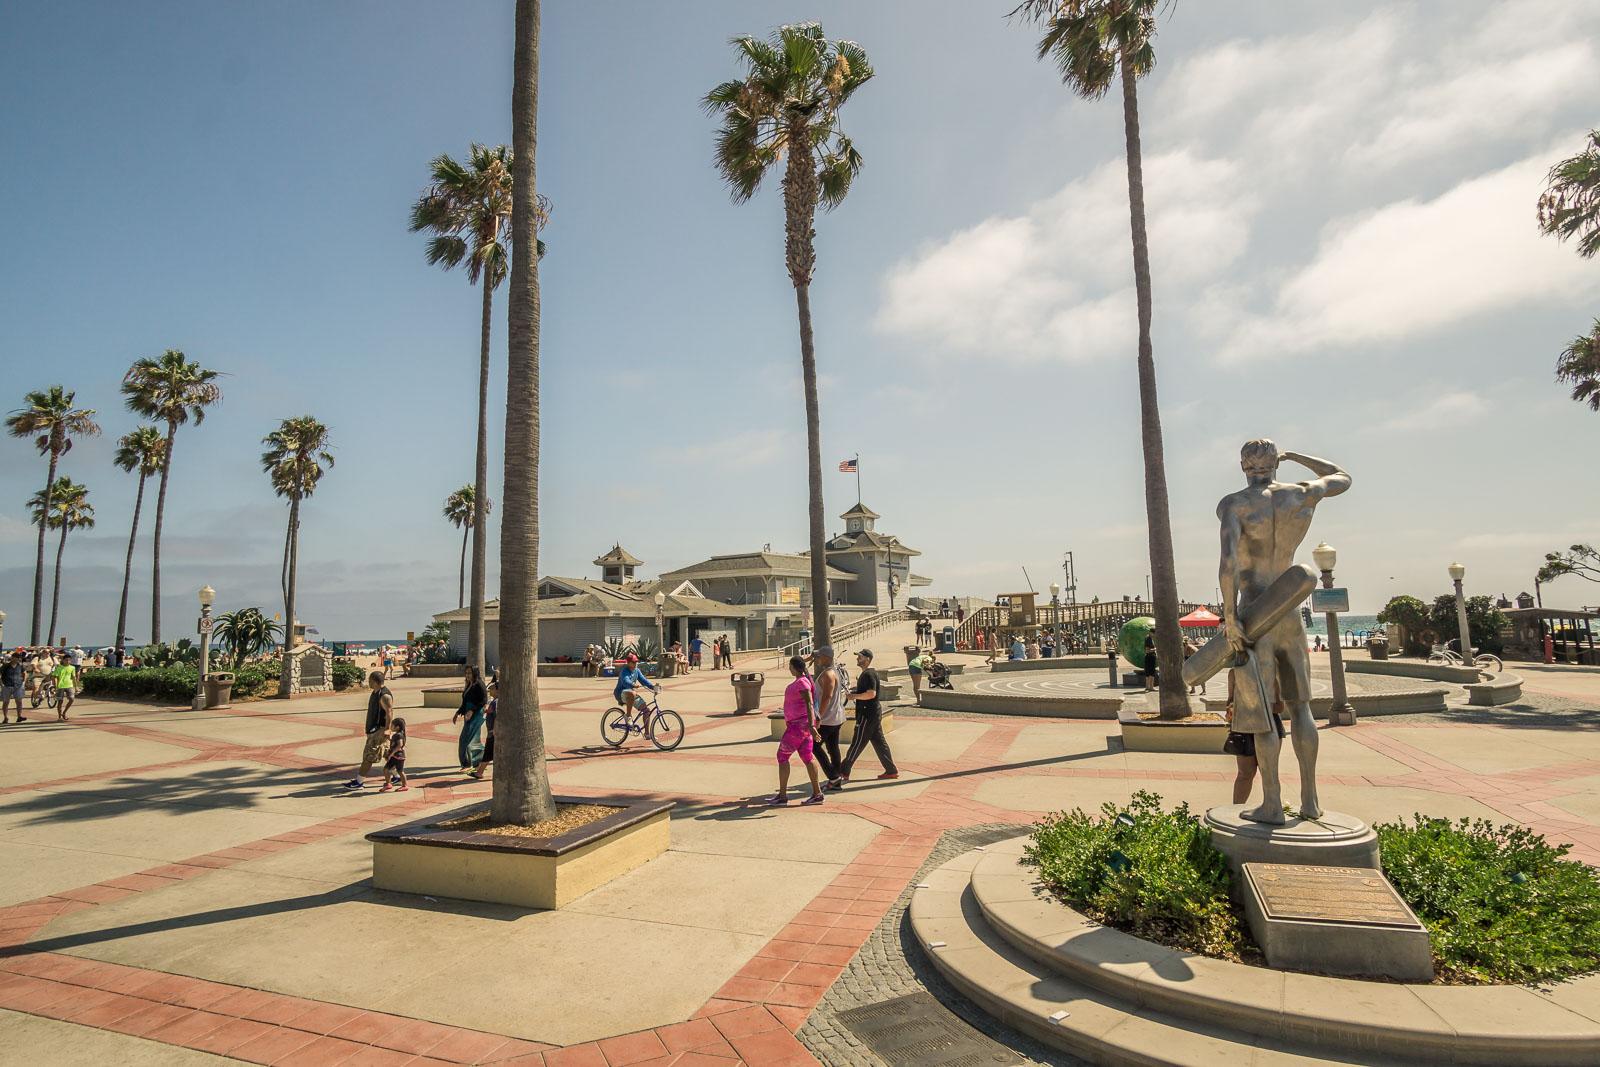 Newport Beach pier Plaza on a sunny afternoon ben lifeguard Monument